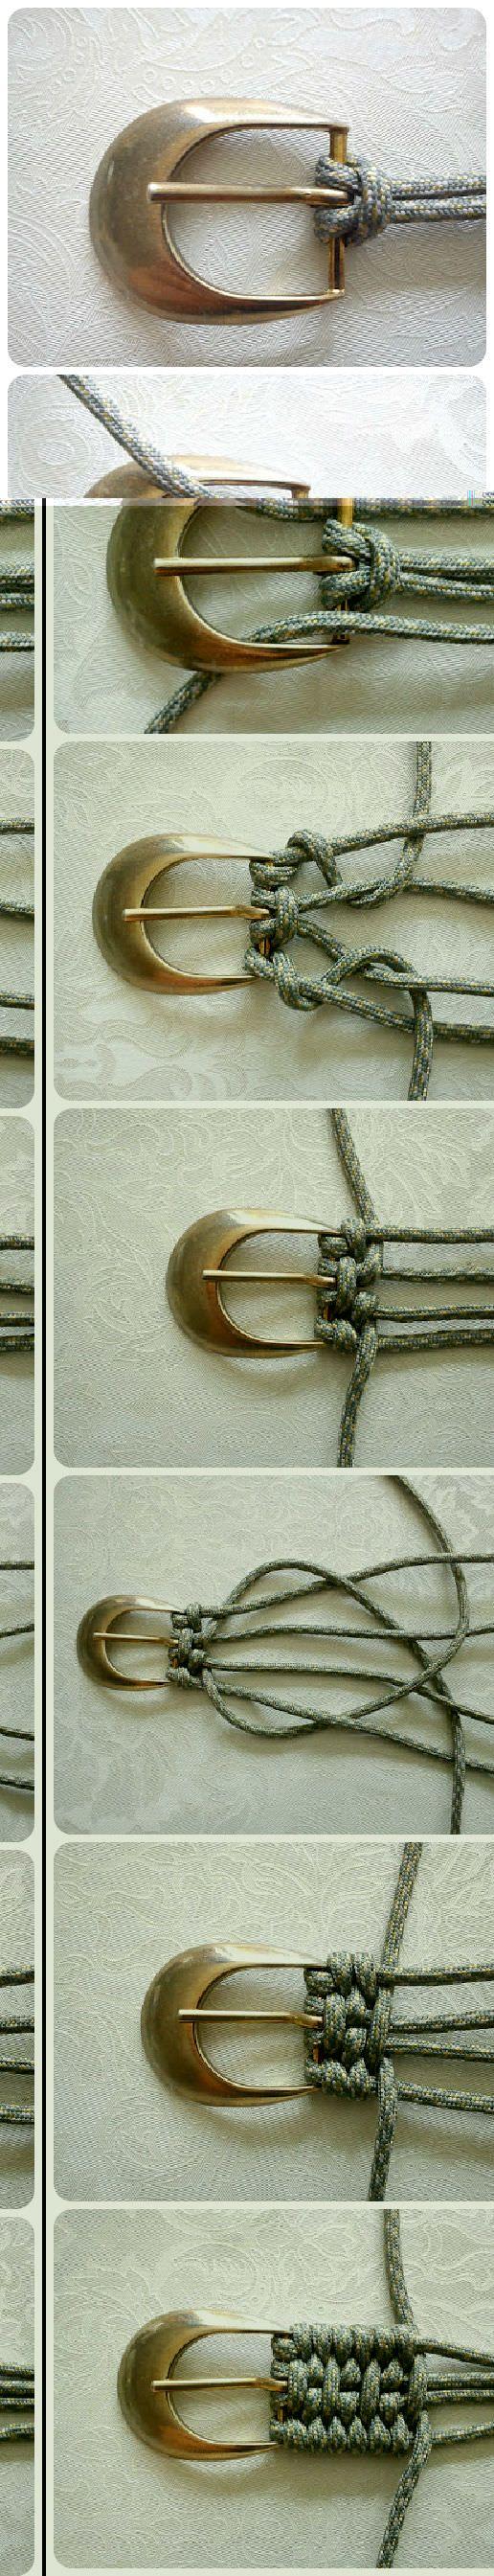 Tutorial: Belt Weaving Using Nylon Cord #diyundselbermachen